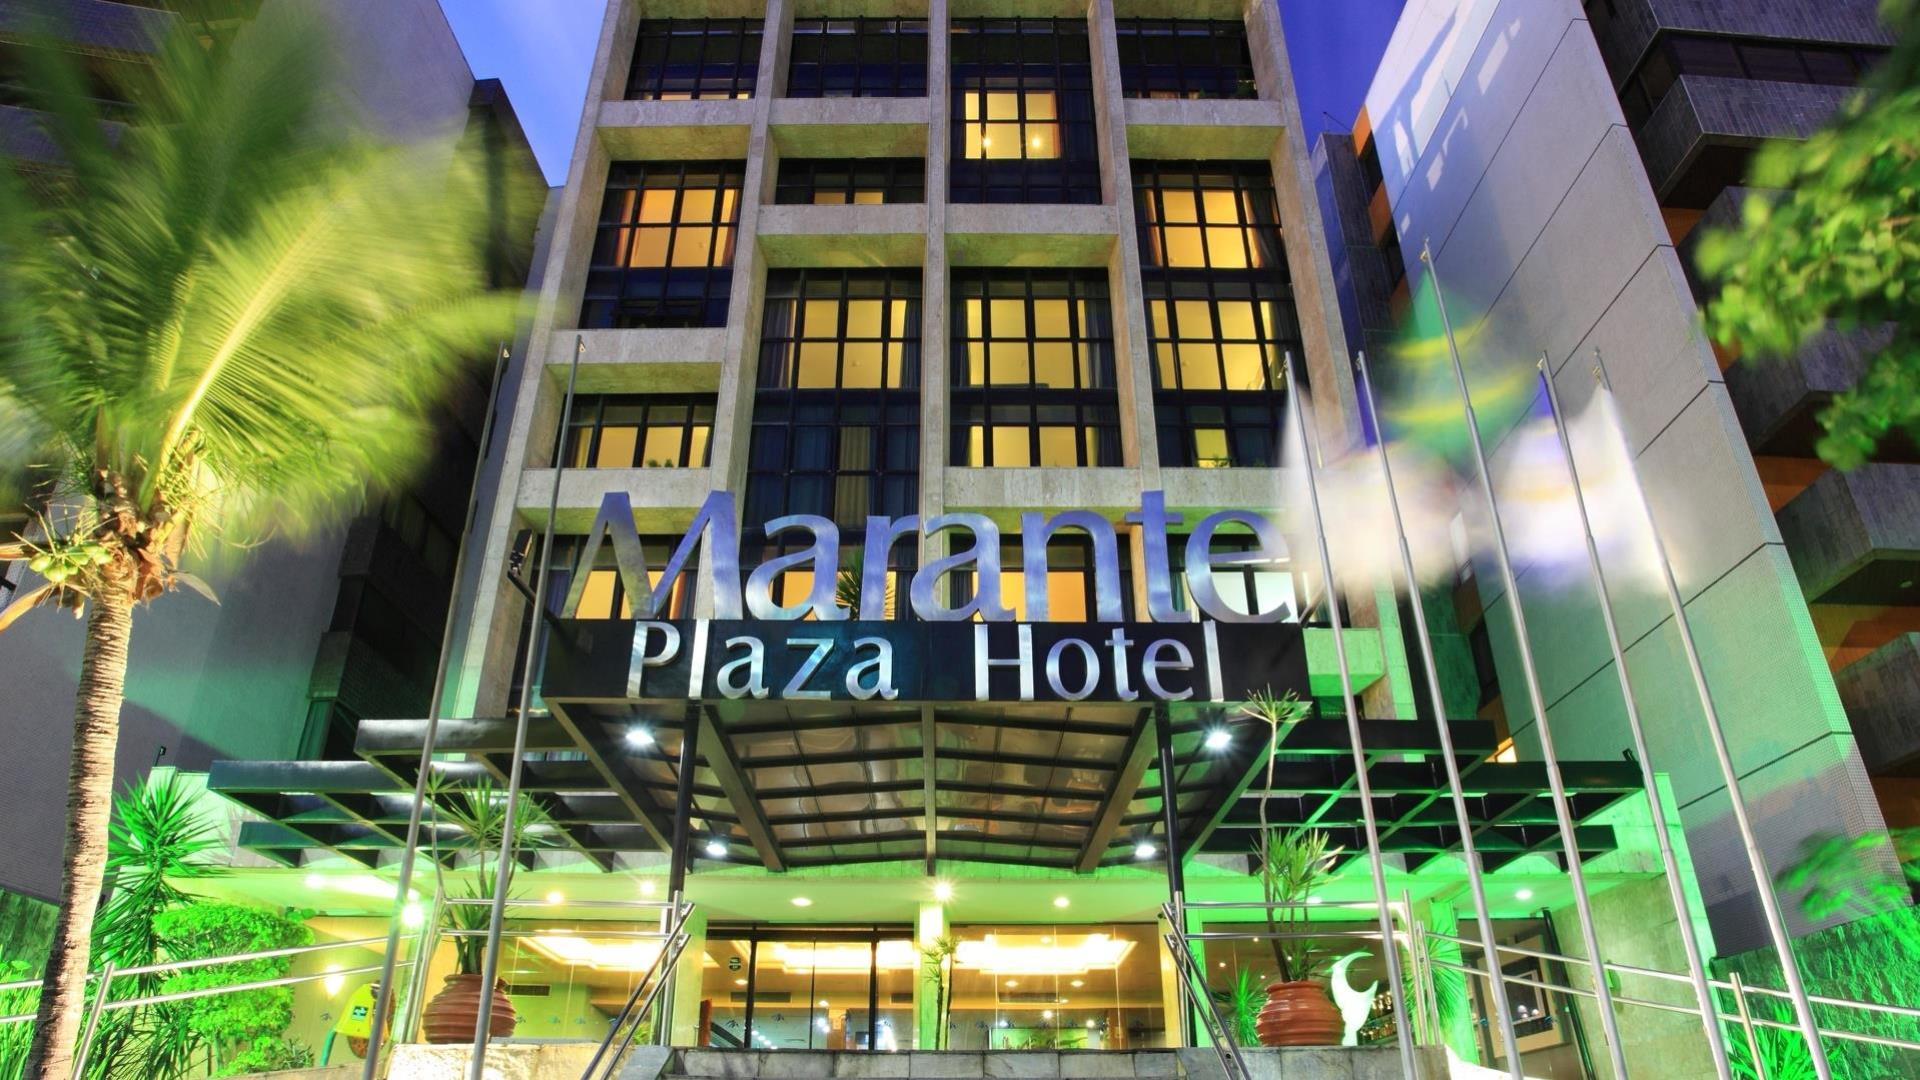 Brasilien Recife: Superior Hotel - Hotel Marante Plaza